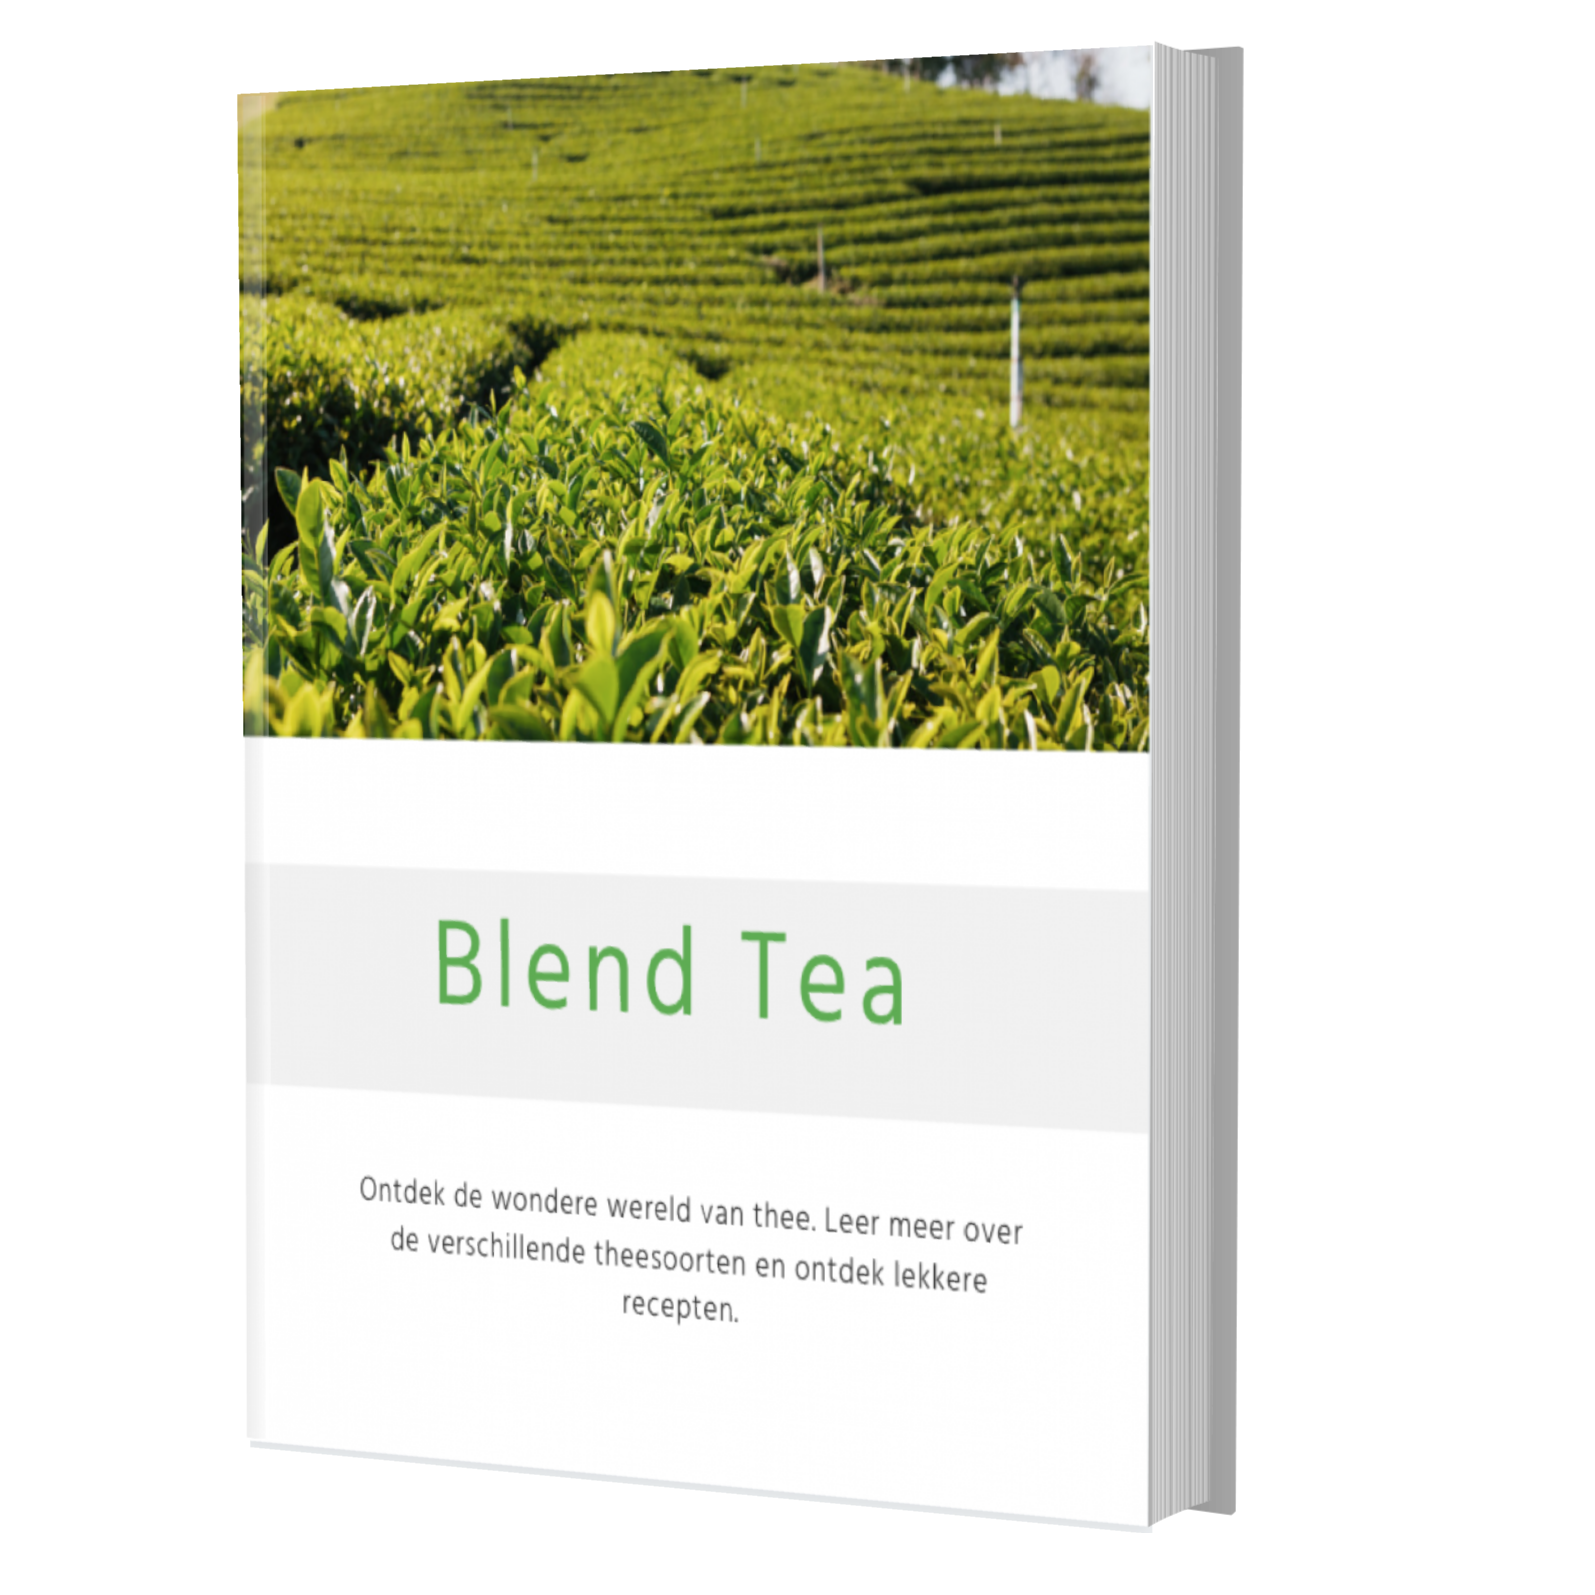 Blend Tea e-book: thee recepten, inspiratie, productieproces